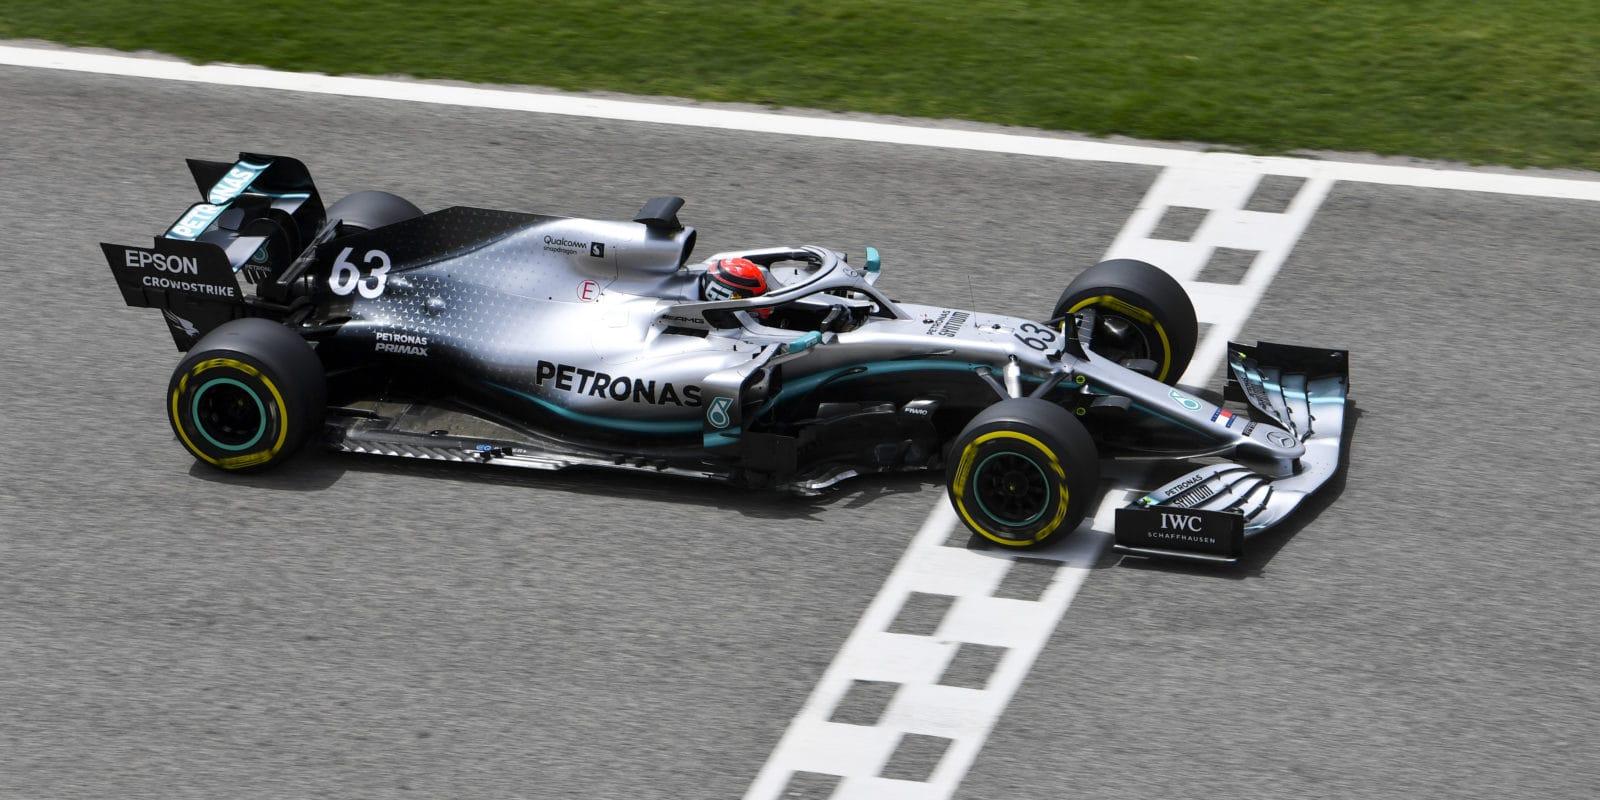 Testy v Bahrajnu: Russell v Mercedesu ochutnal opačný konec výsledků